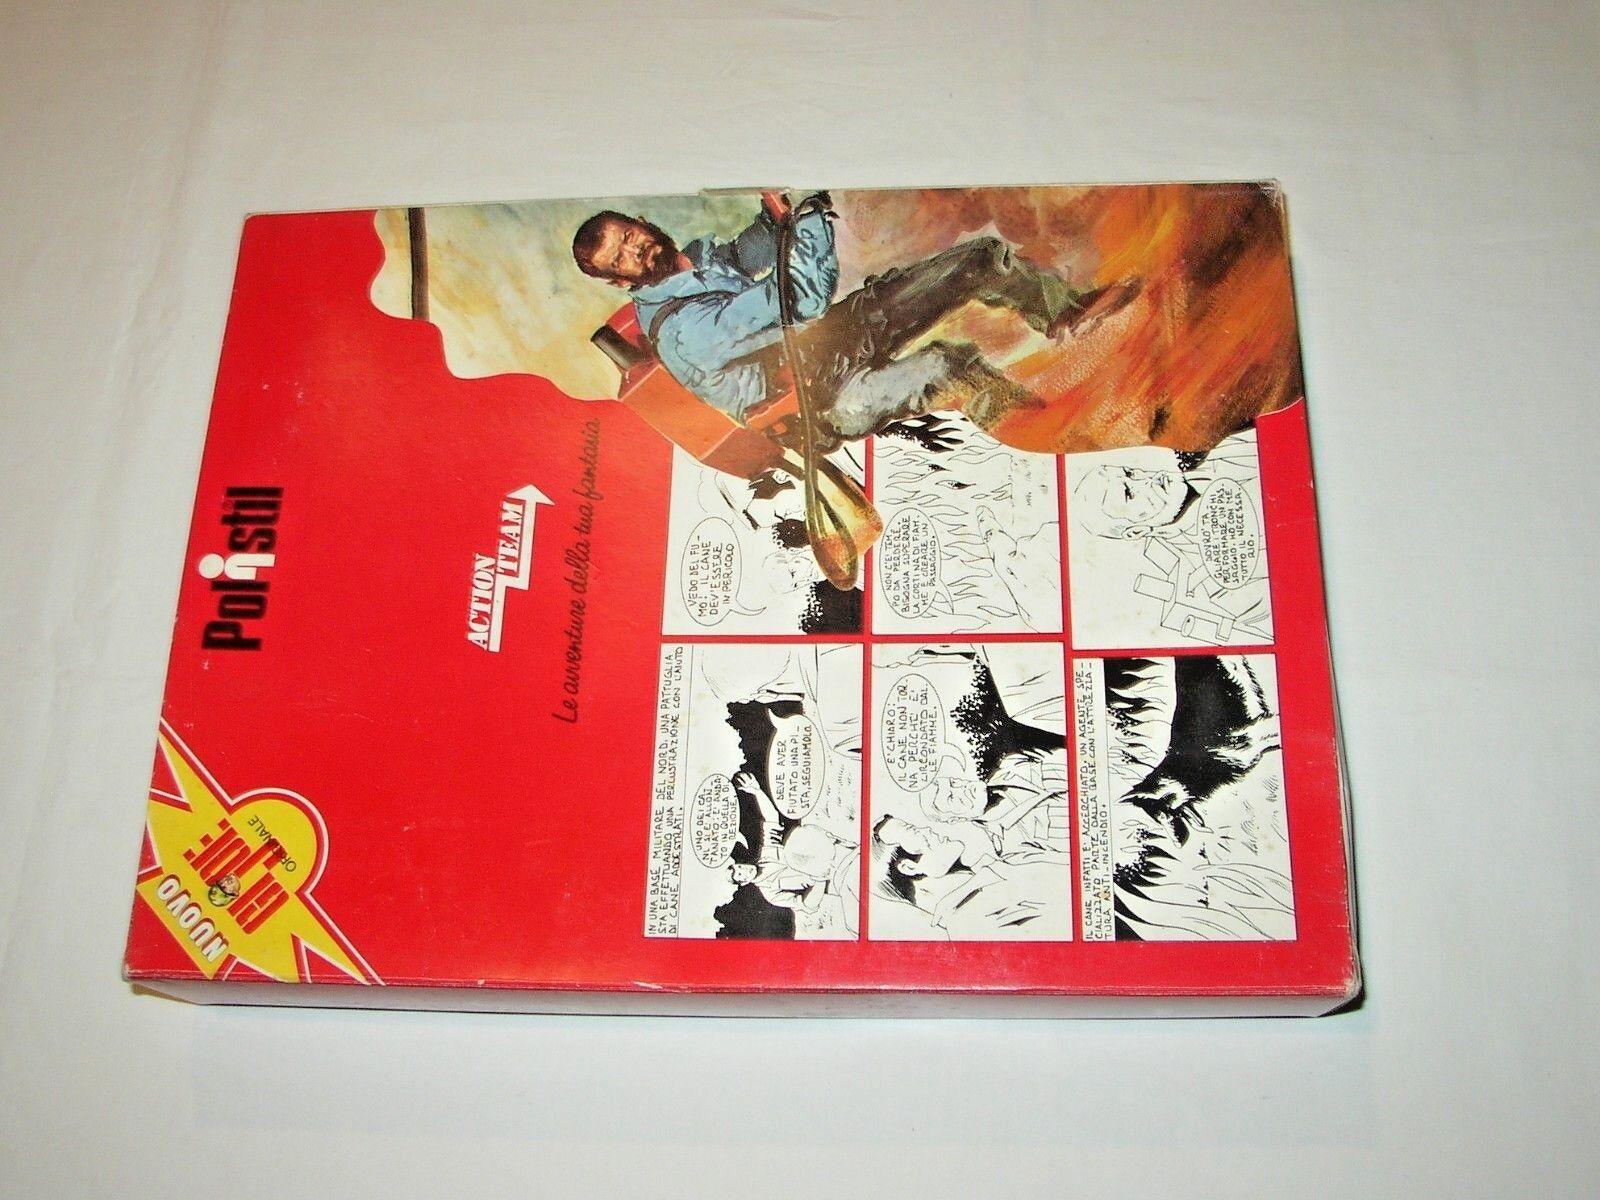 GI JOE Acción TEAM_1975_HASBRO POLISTIL_SEALED SET   34 VELA DEL DESERTO MIB